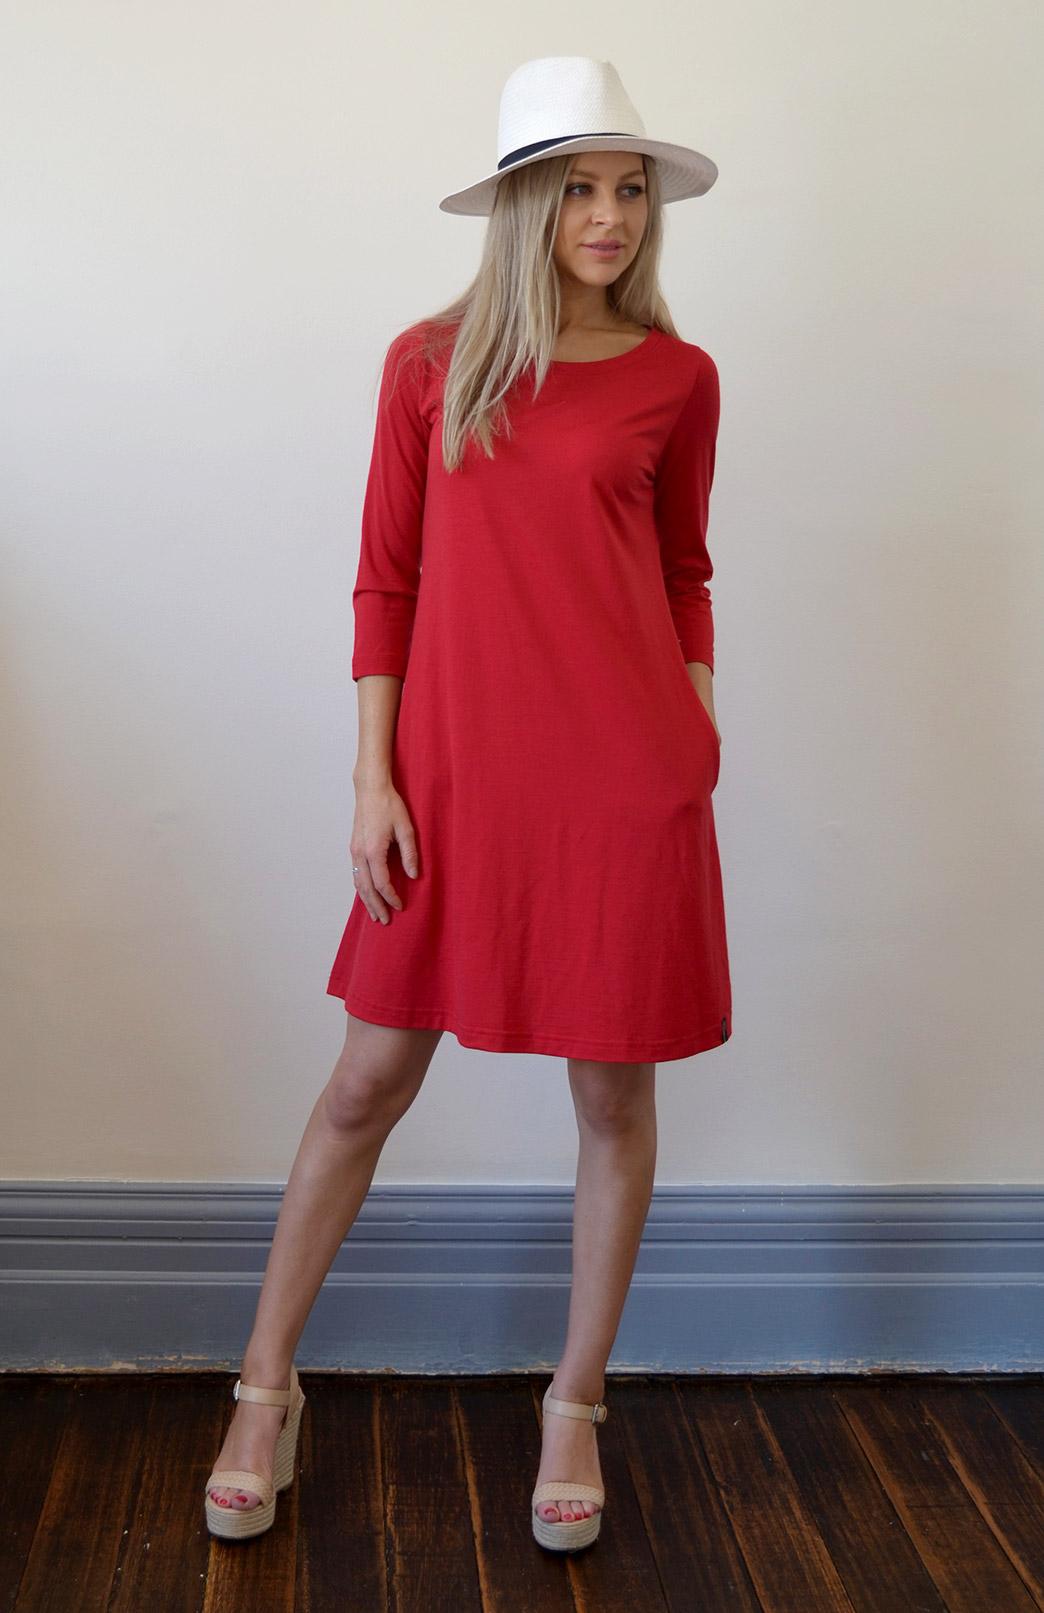 The Red Ellie Dress- Full colour range available  here